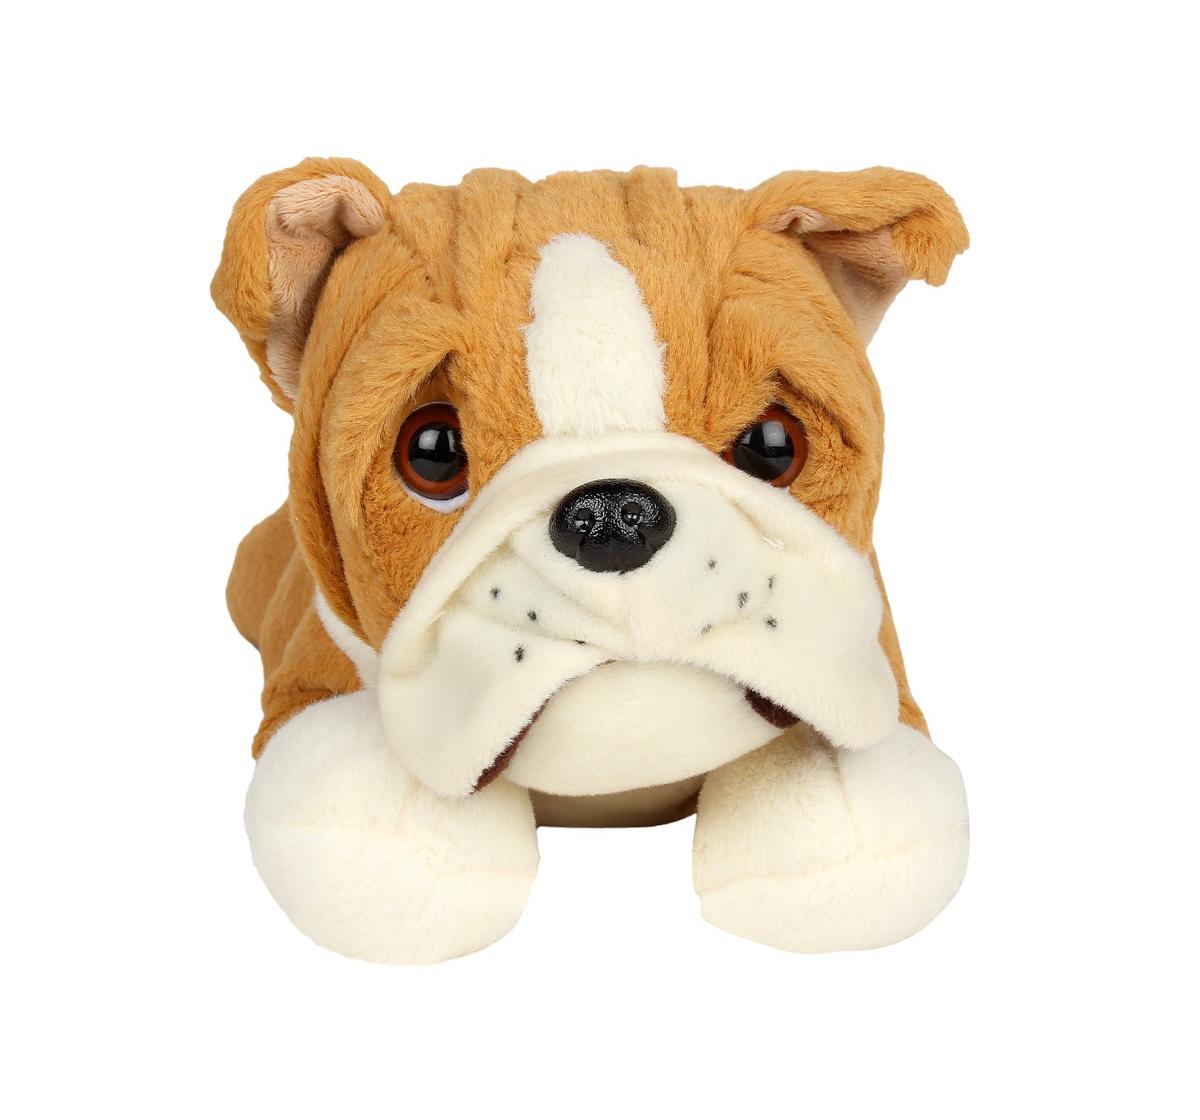 Cuddles | Cuddles Sleeping Bulldog 40 Cms Plush Toy for New Born Kids age 0M+